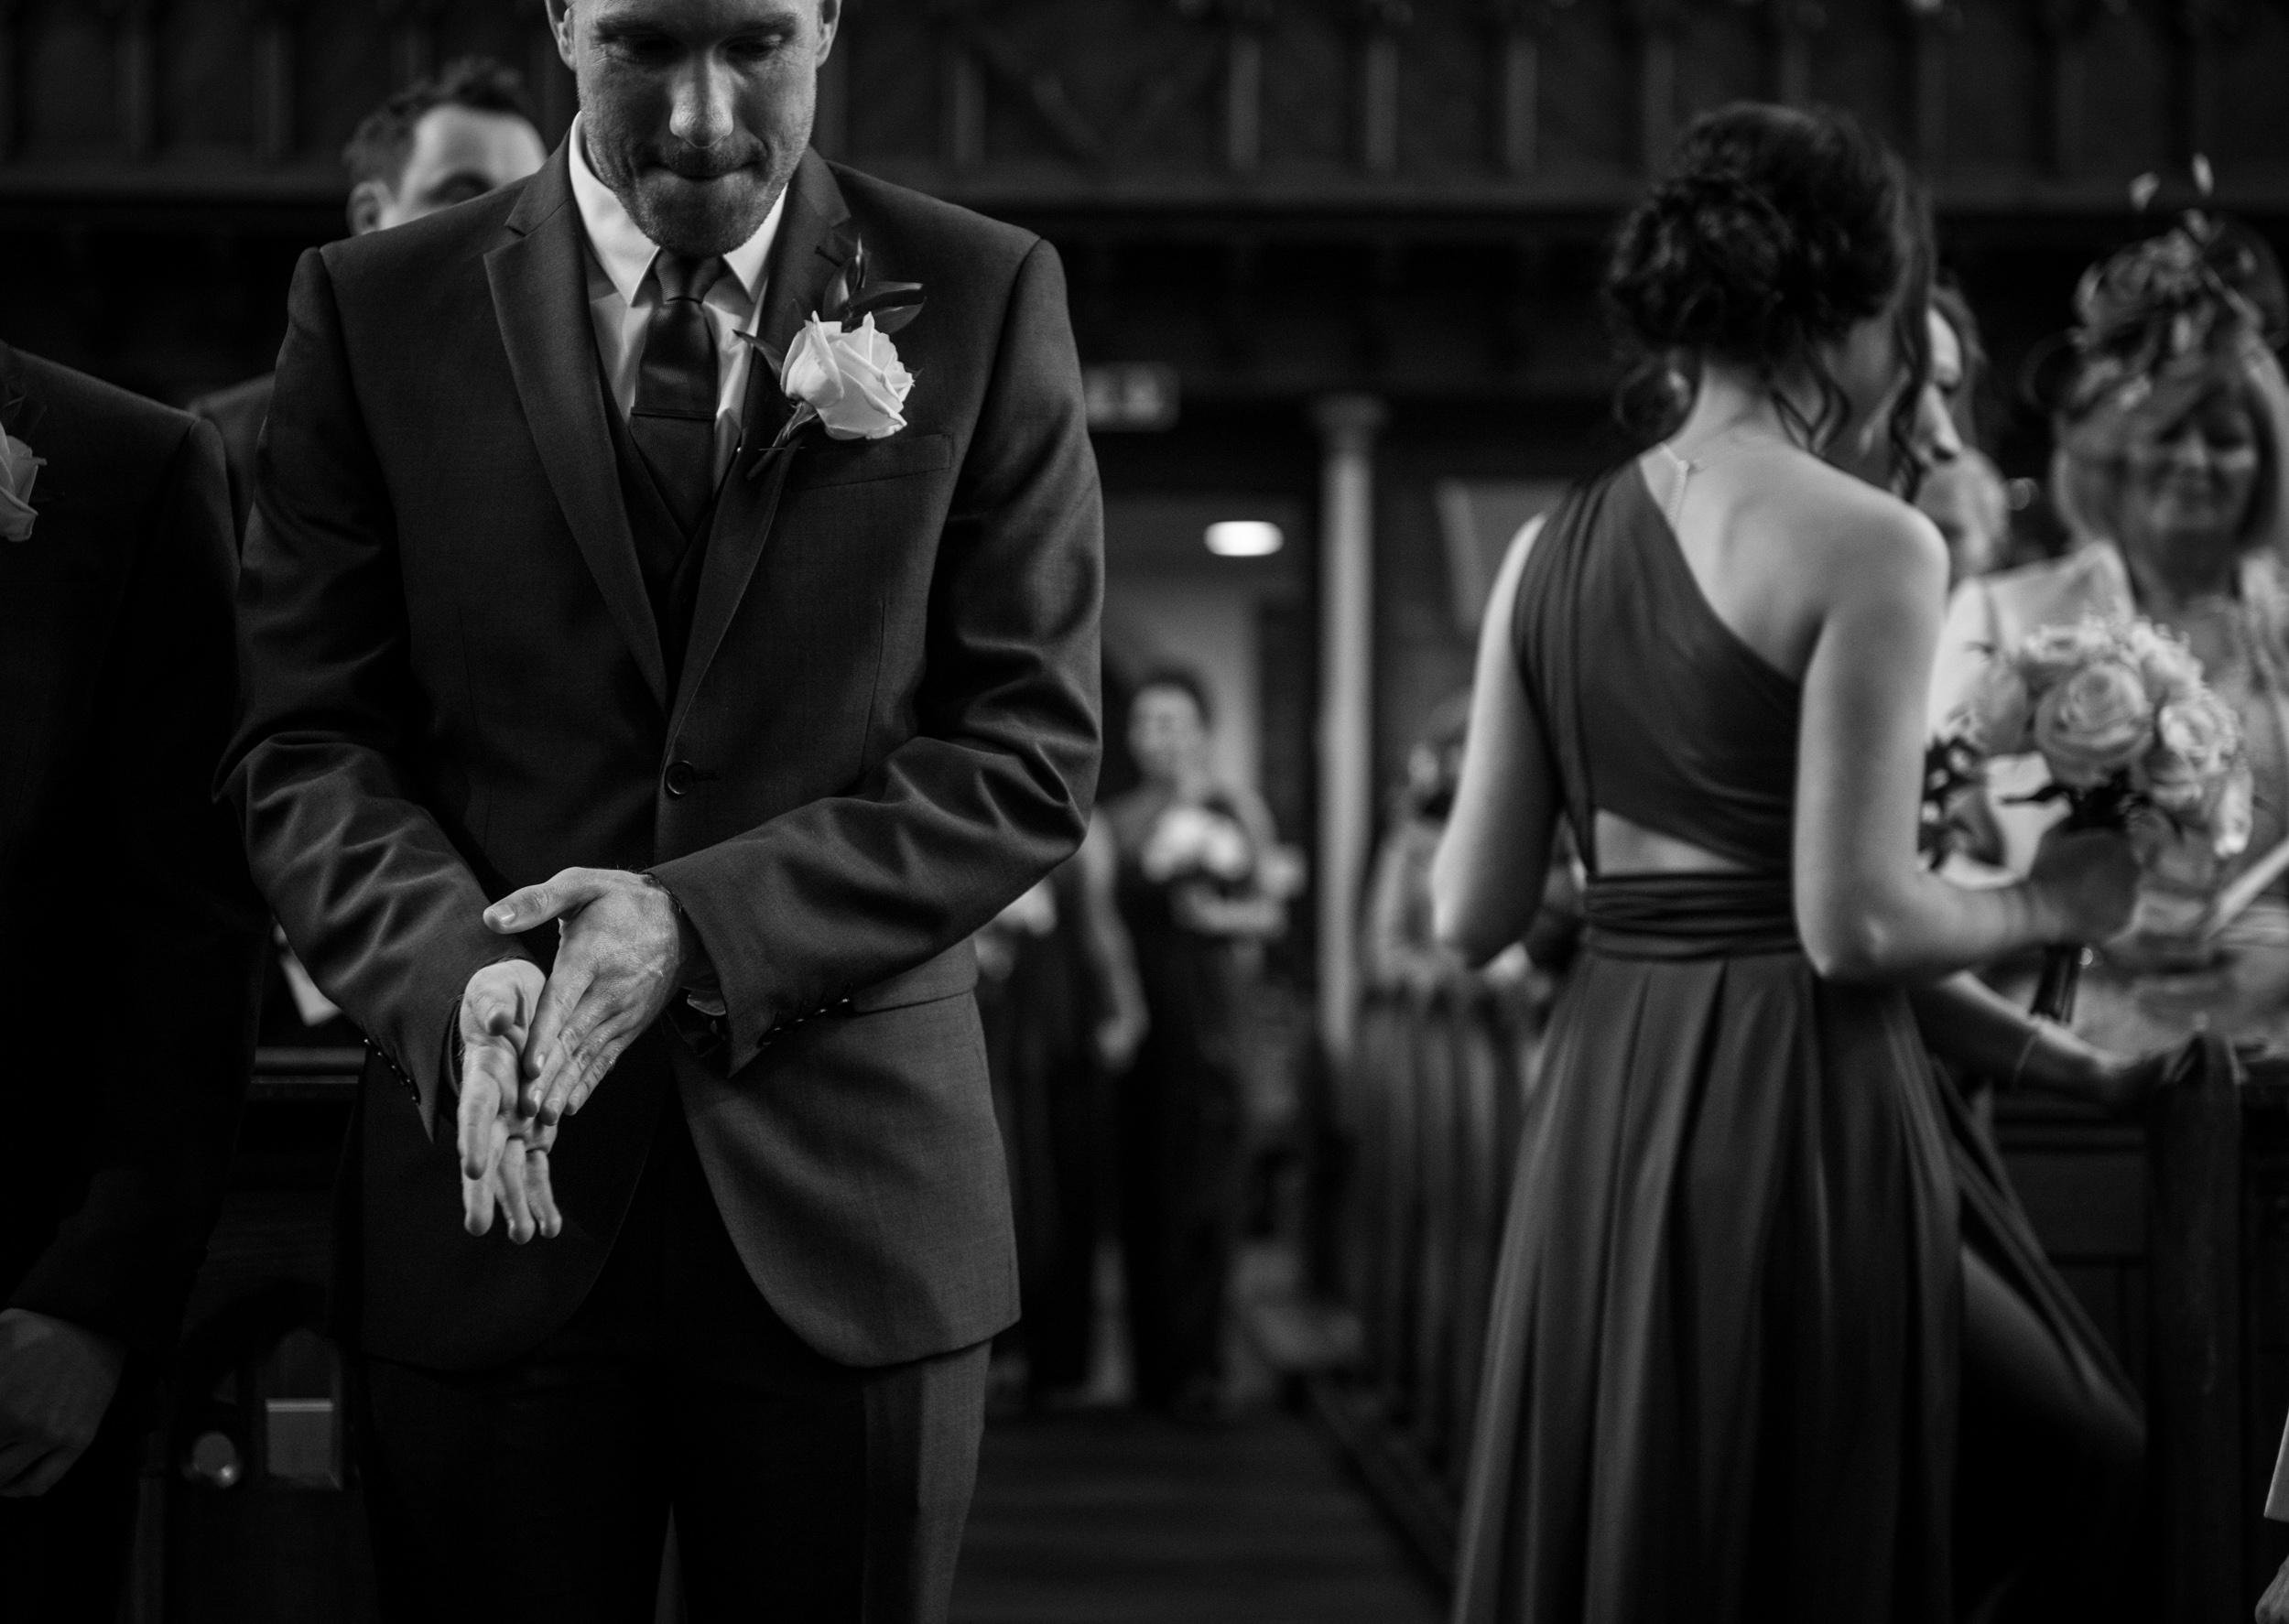 David Scholes Lancashire wedding photography 2016-47.jpg